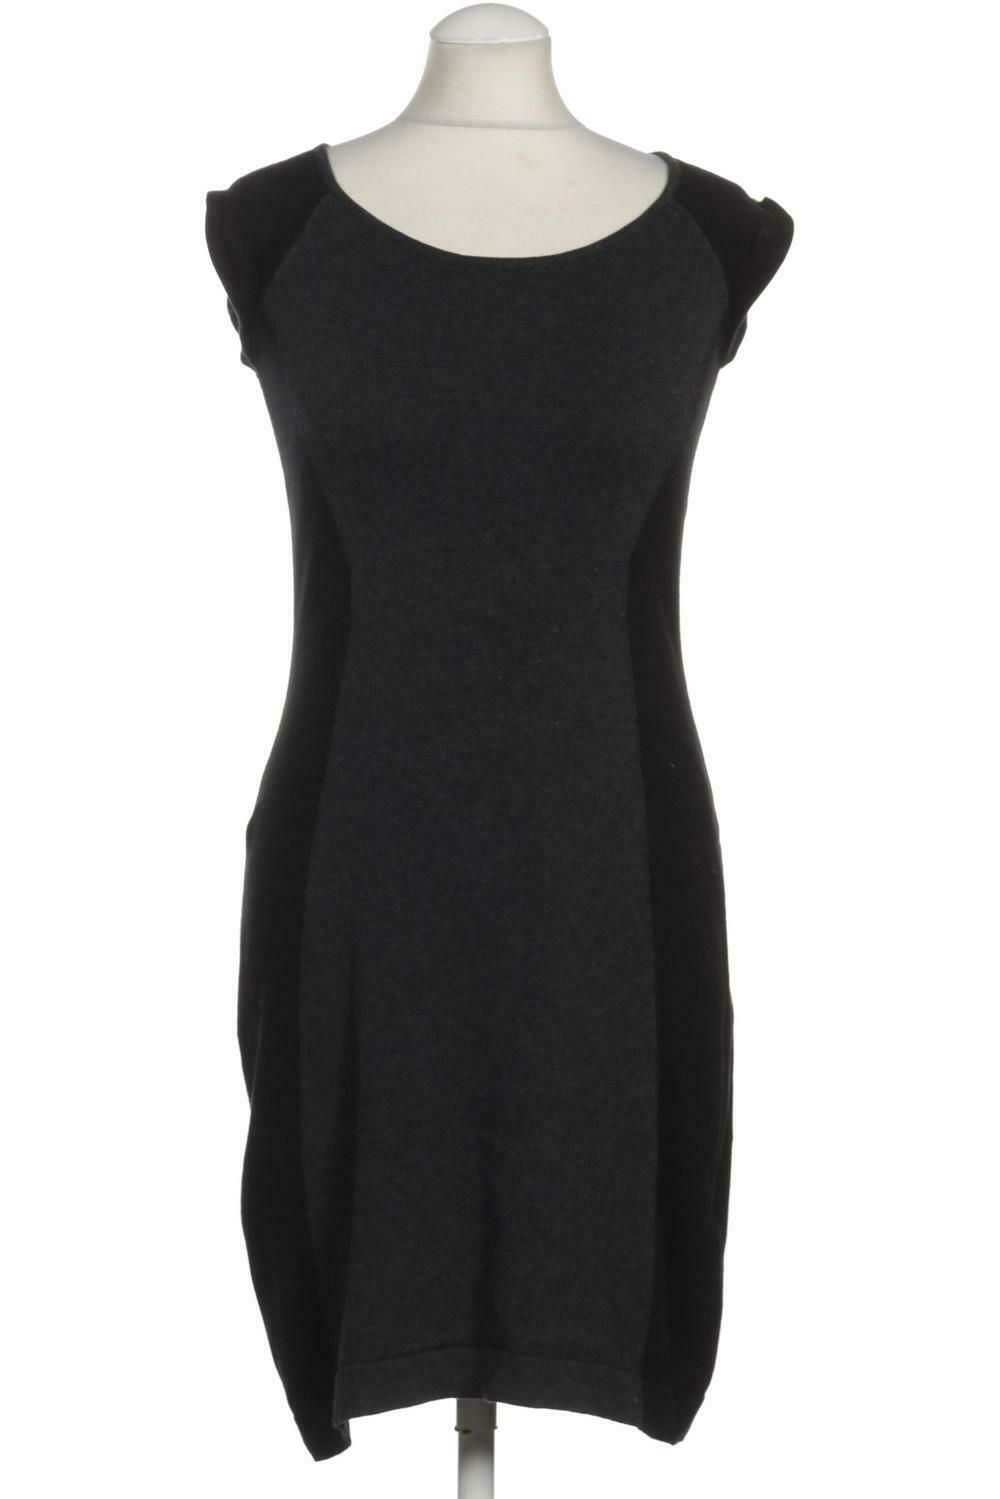 ZERO Kleid Damen Dress Damenkleid Gr. DE 12 Baumwolle schwarz